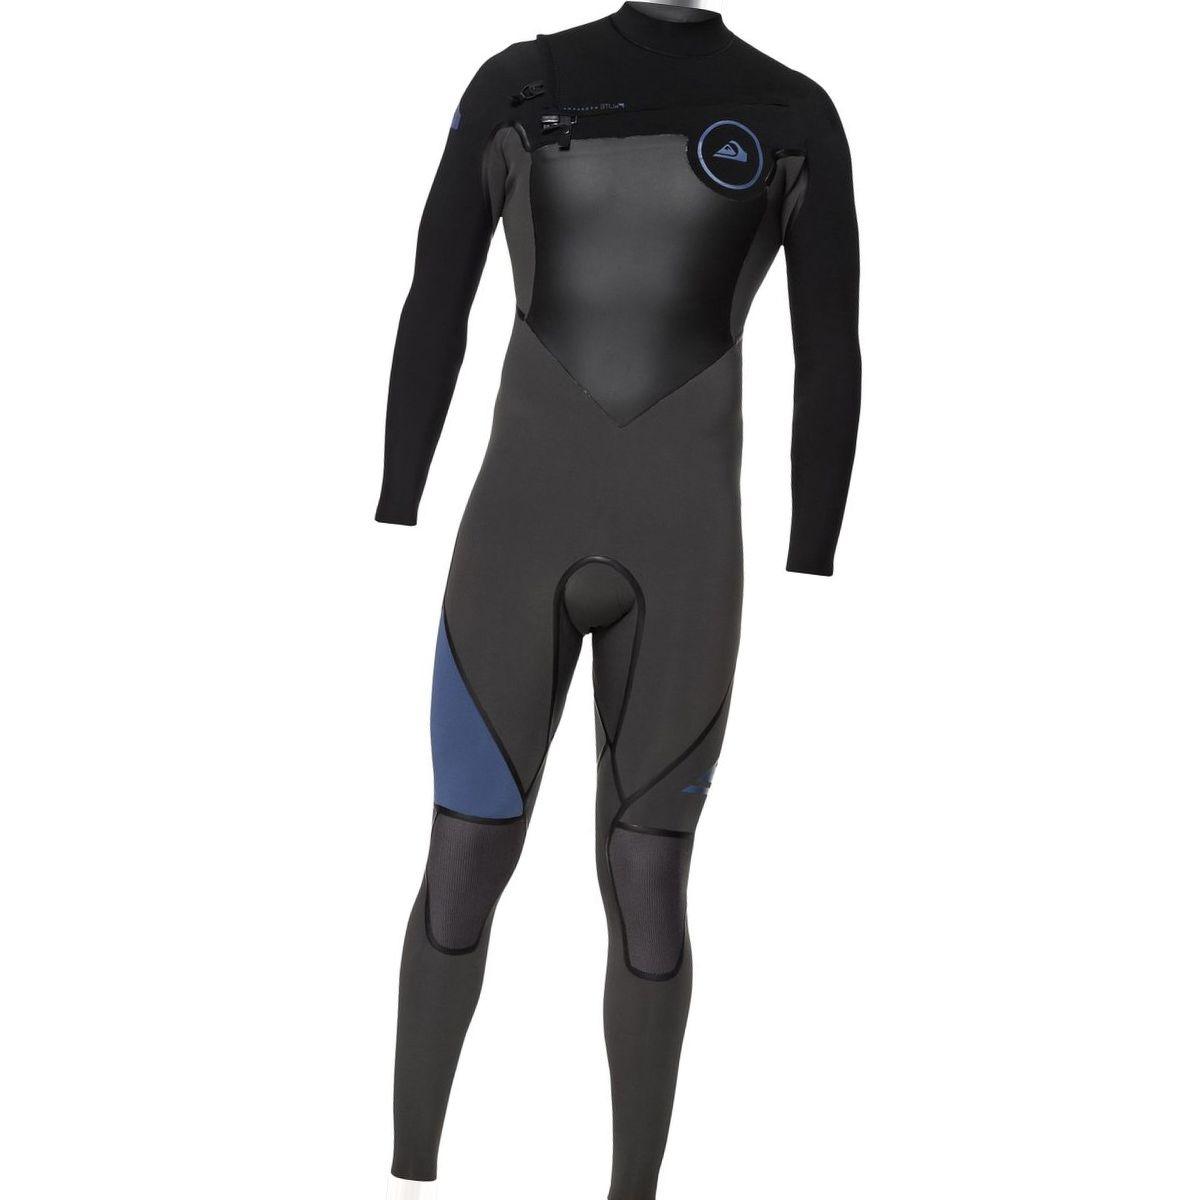 Quiksilver 3/2 Syncro Plus Chest Zip LFS Wetsuit - Men's